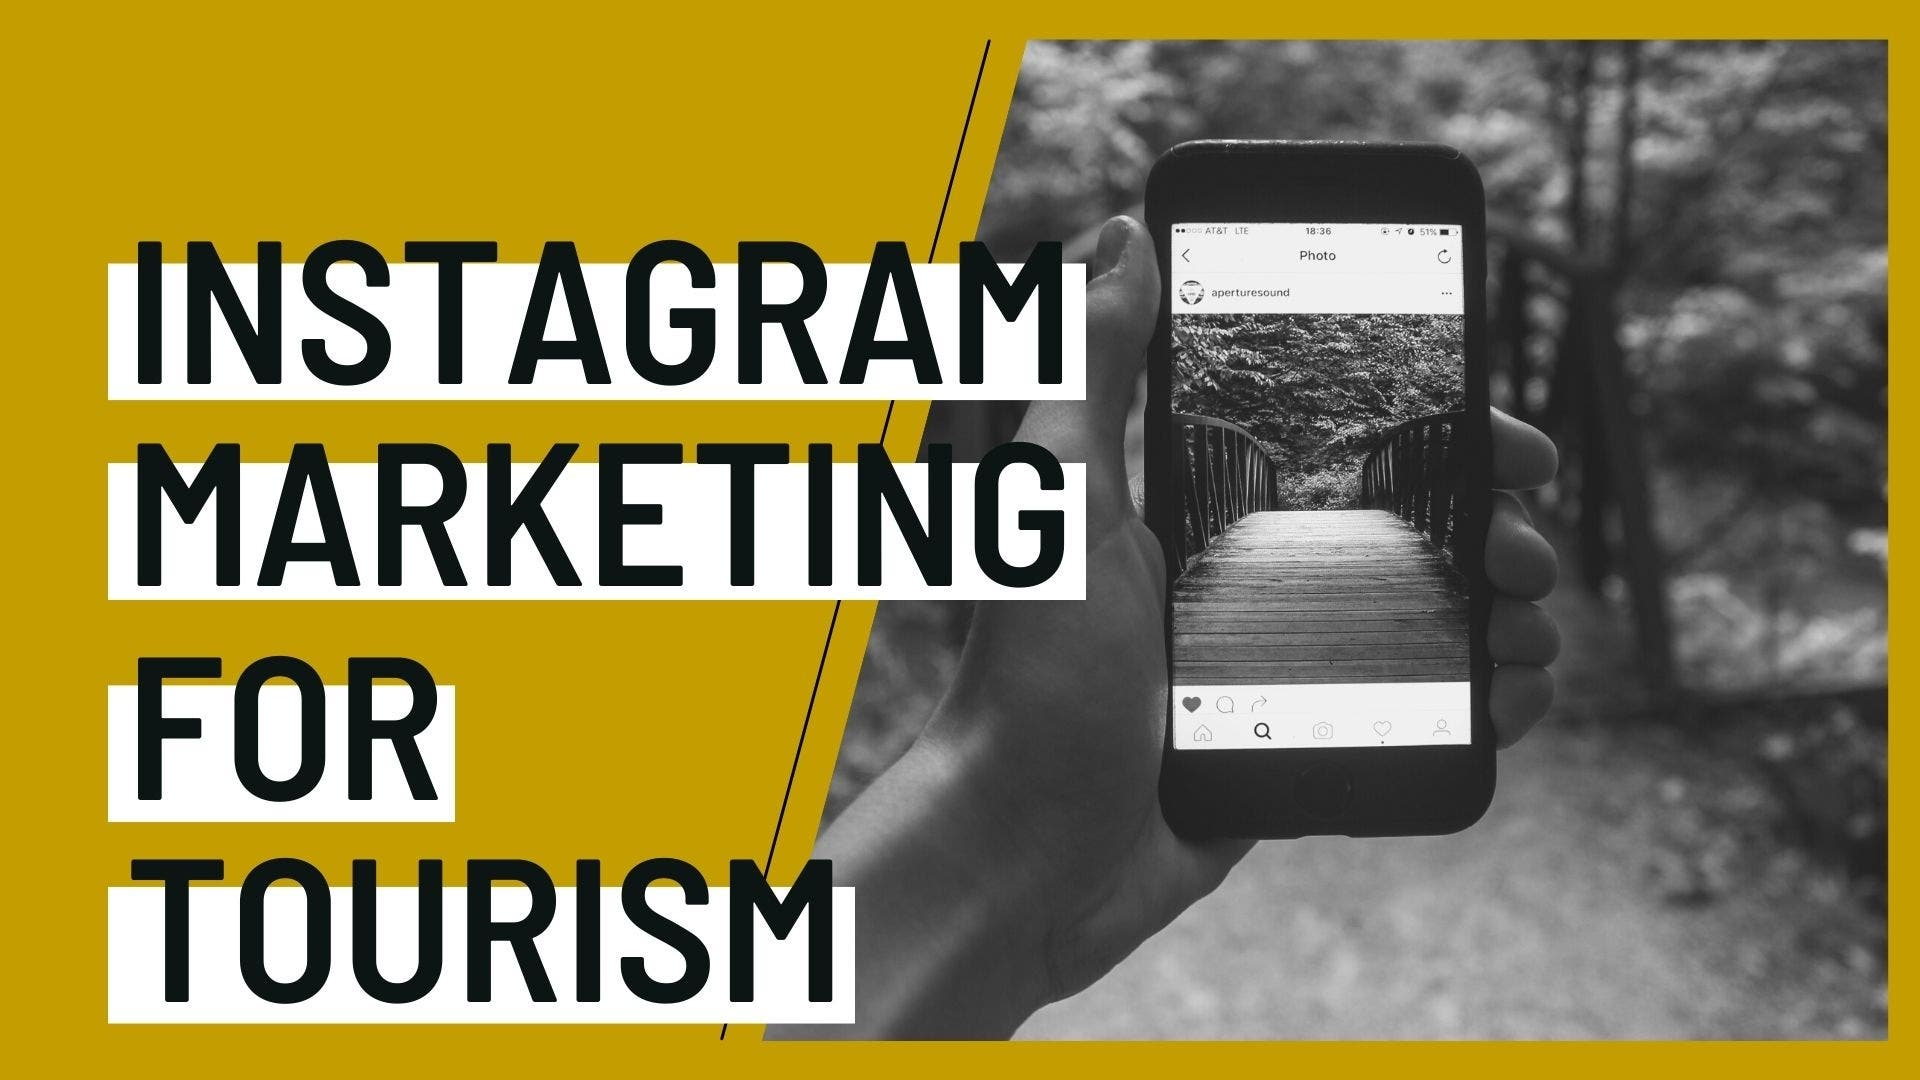 Instagram Marketing for Tourism